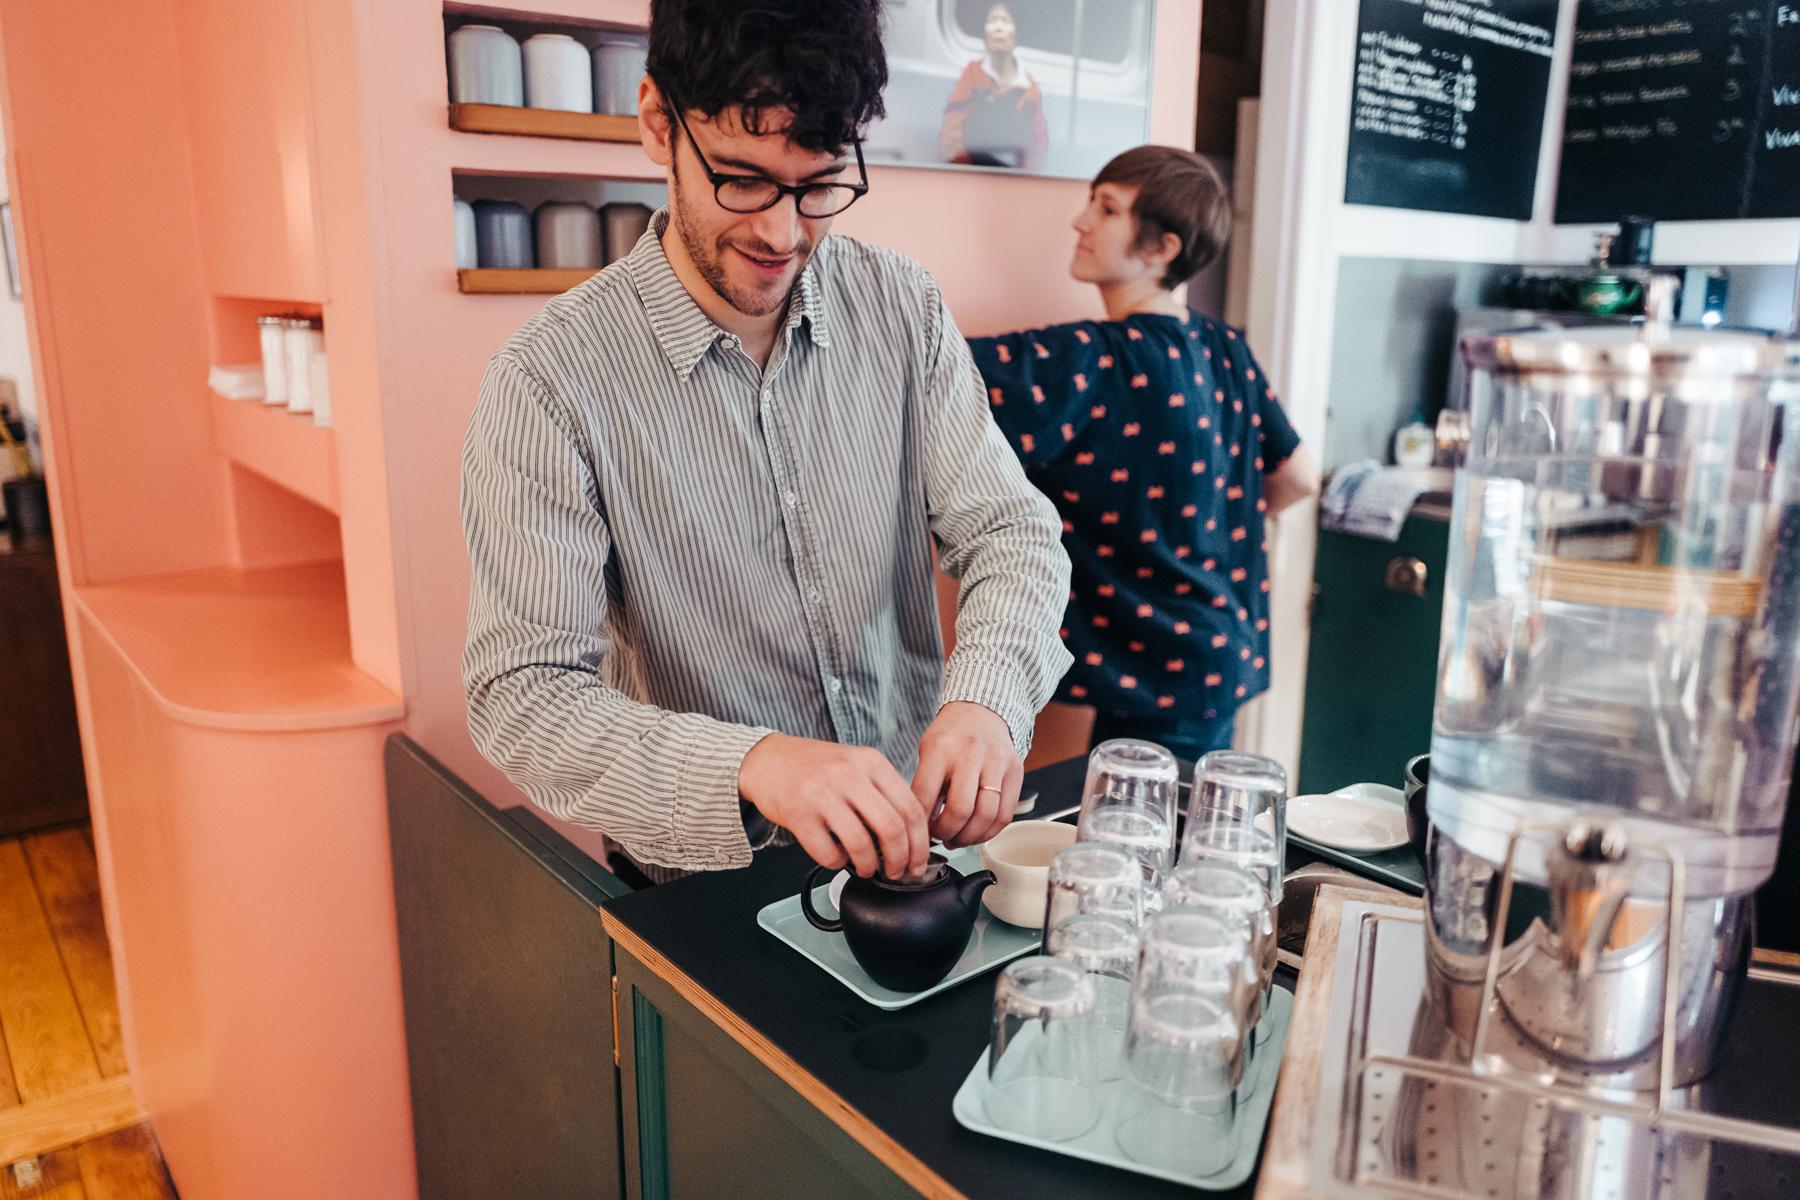 Geheimtipp Hamburg Essen & Trinken Café Eppendorf Lowinsky's Dahlina Sophie Kock 4